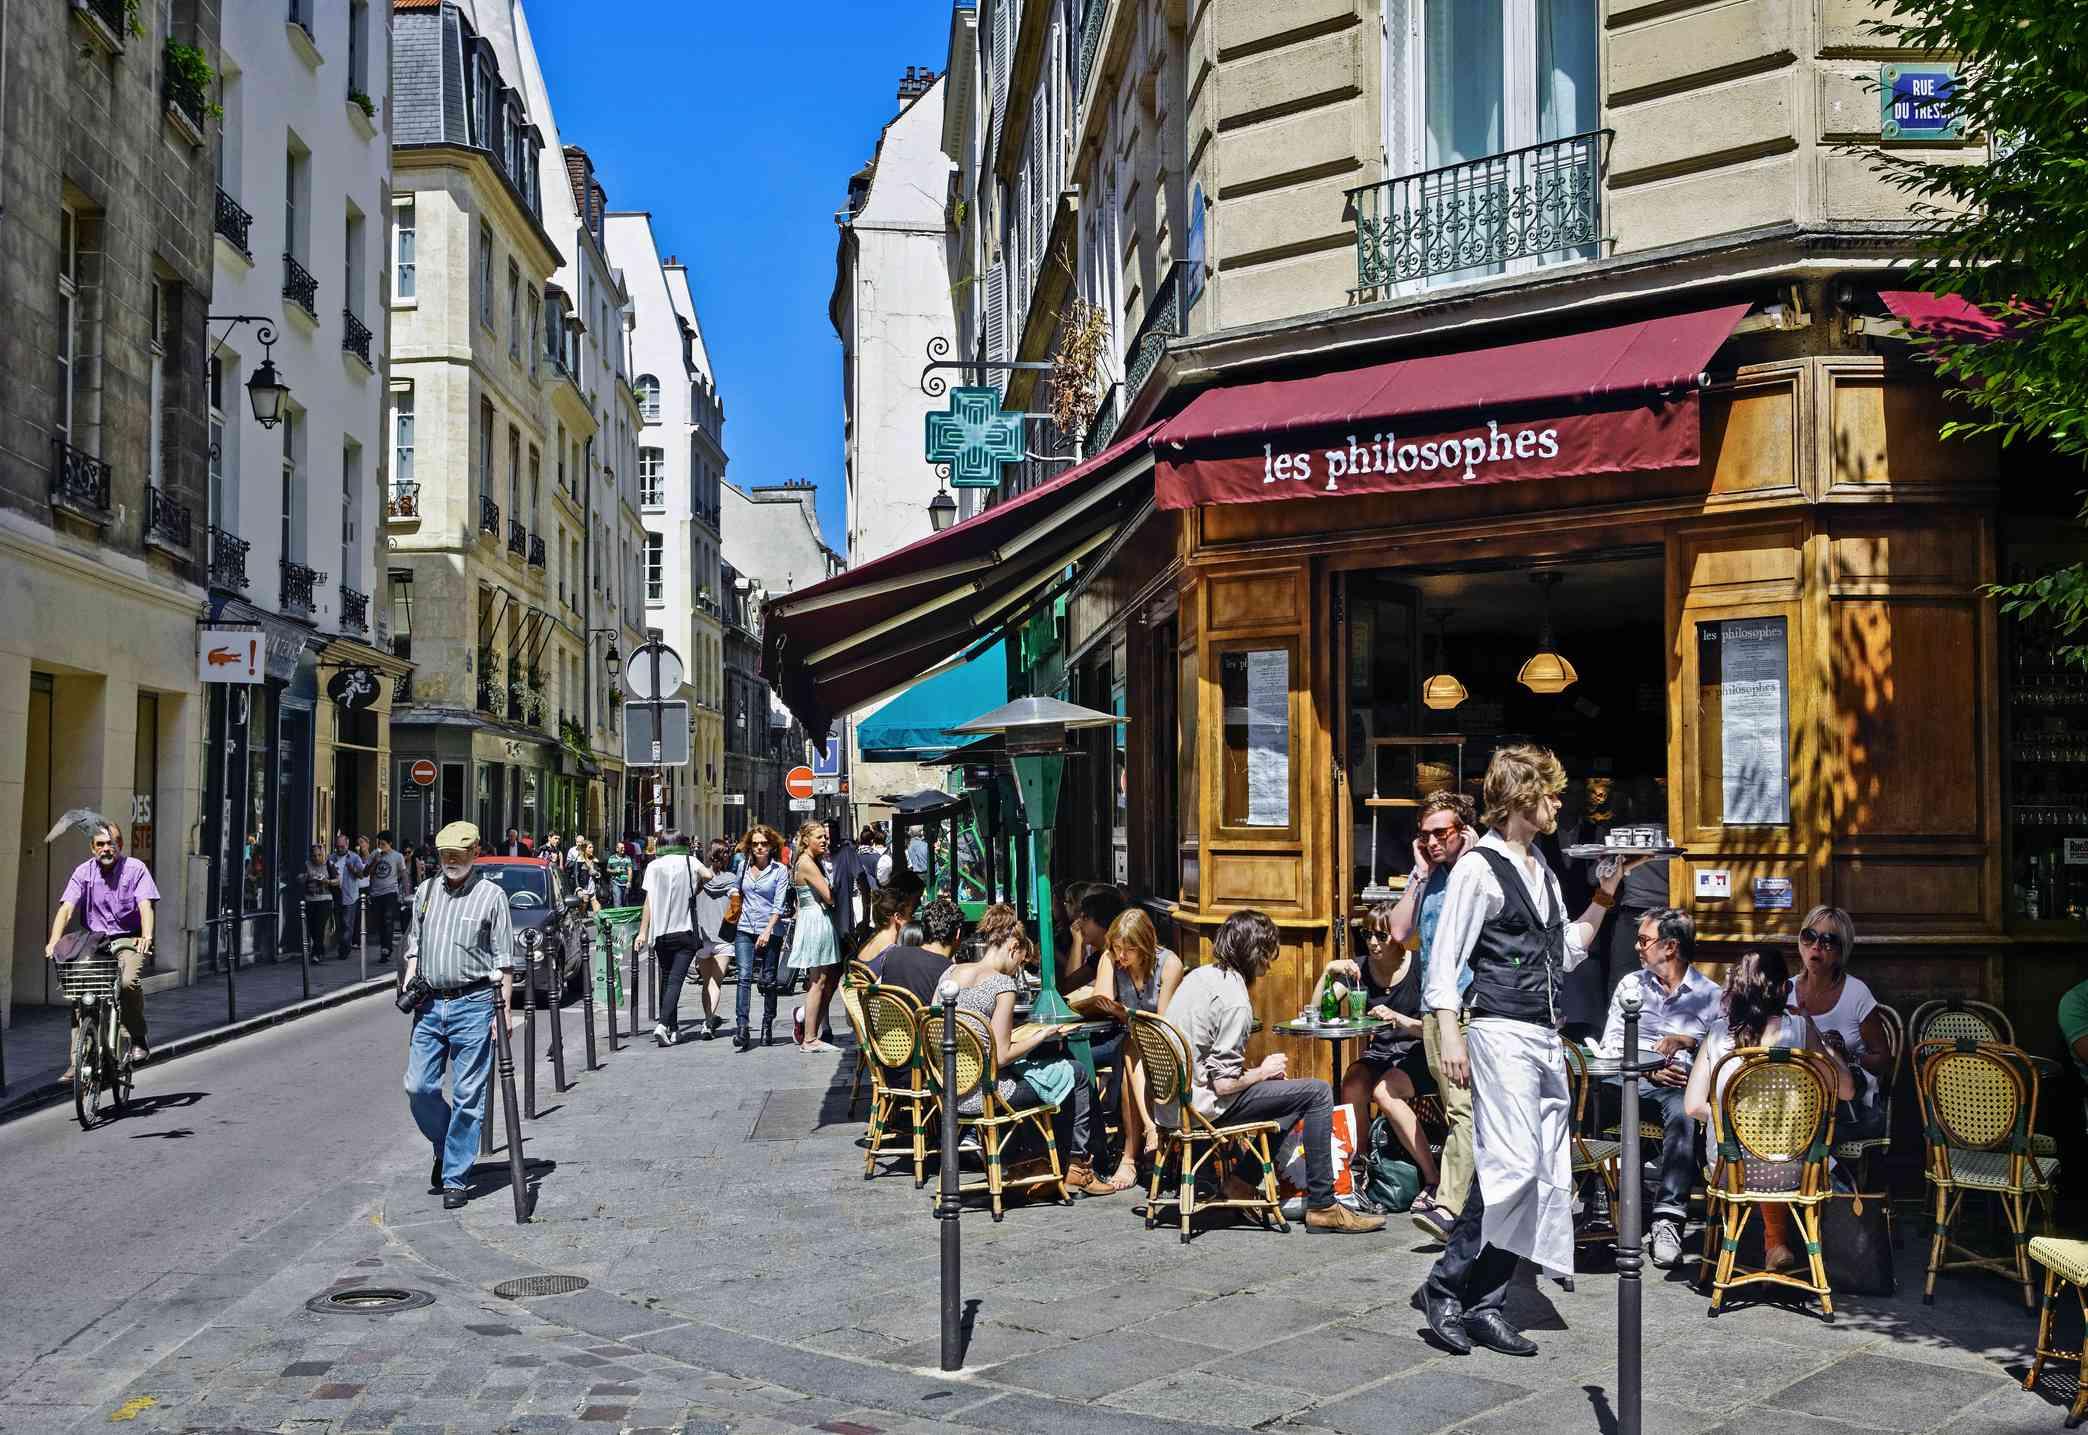 Café terrace and street in Marais, Paris